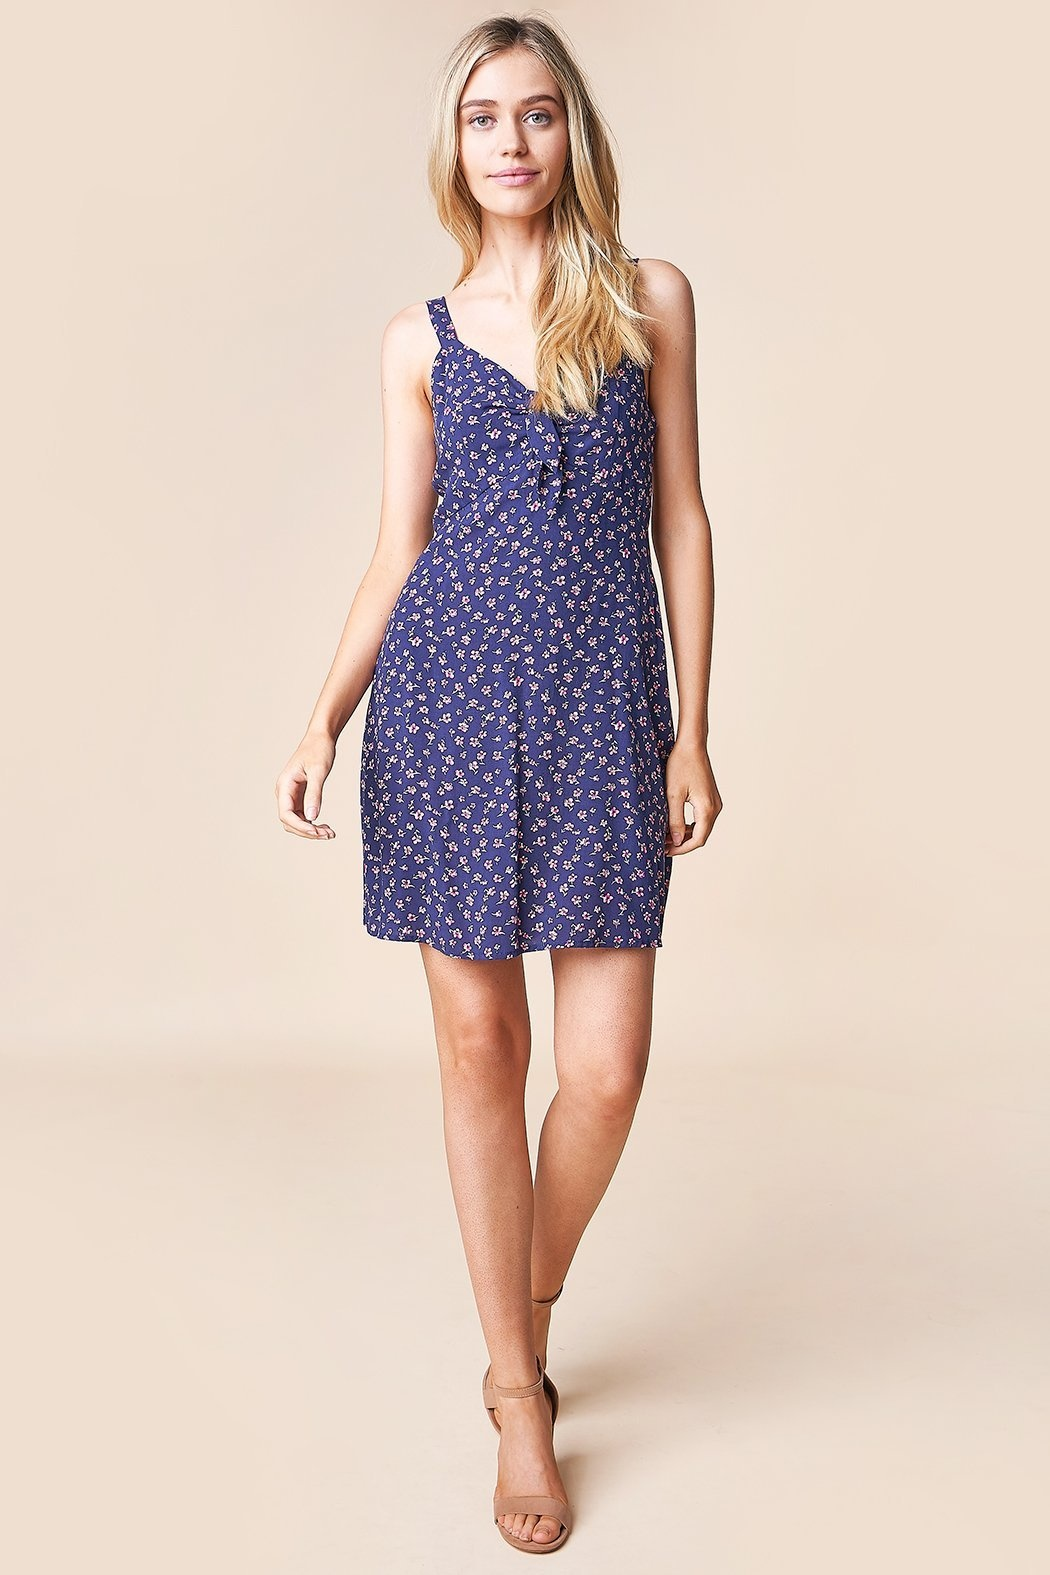 Sugarlips Dress Casablanca Slv/Less Mini w/ Chest Tie